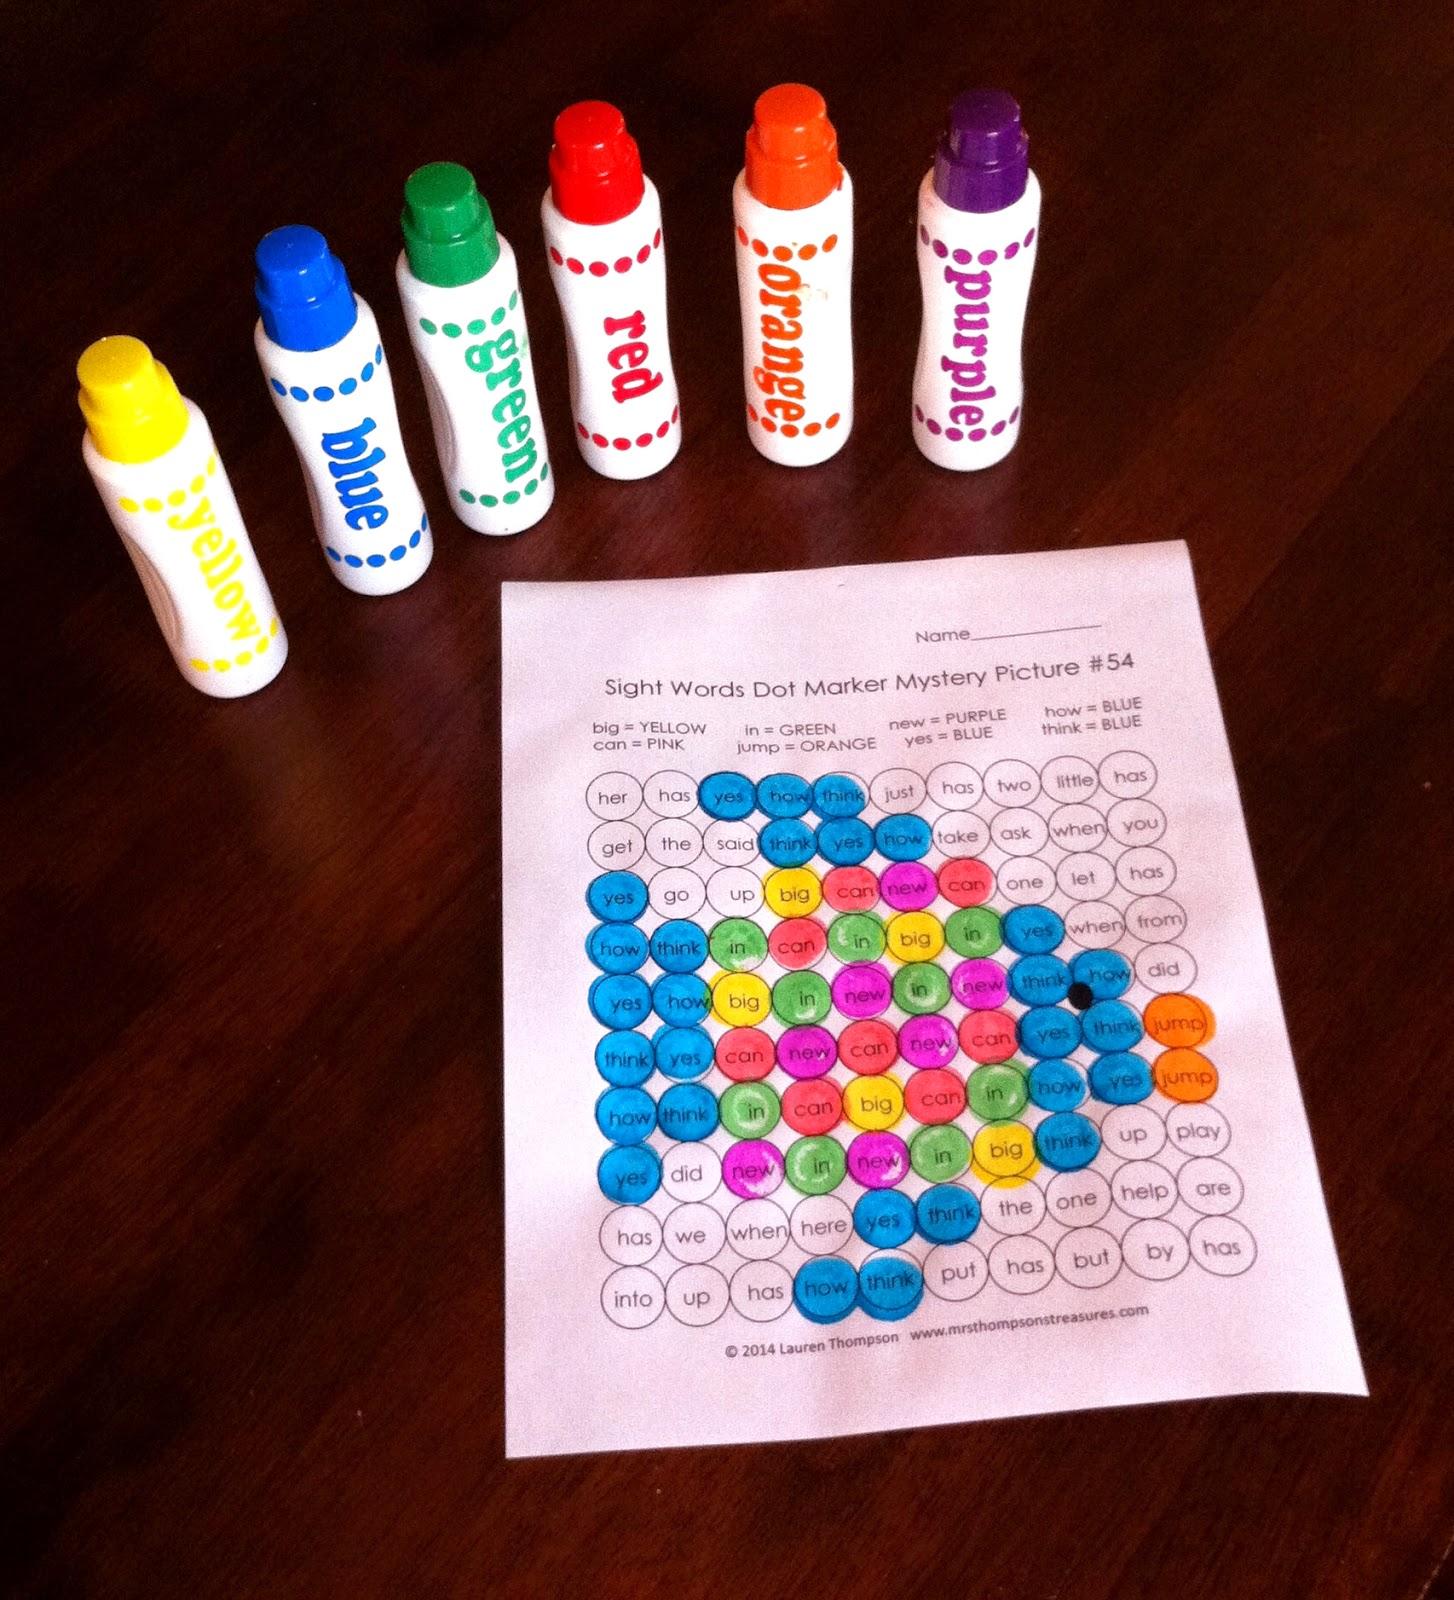 http://www.teacherspayteachers.com/Product/Dot-Marker-Mystery-Picture-Activities-SIGHT-WORDS-Bundle-1450868